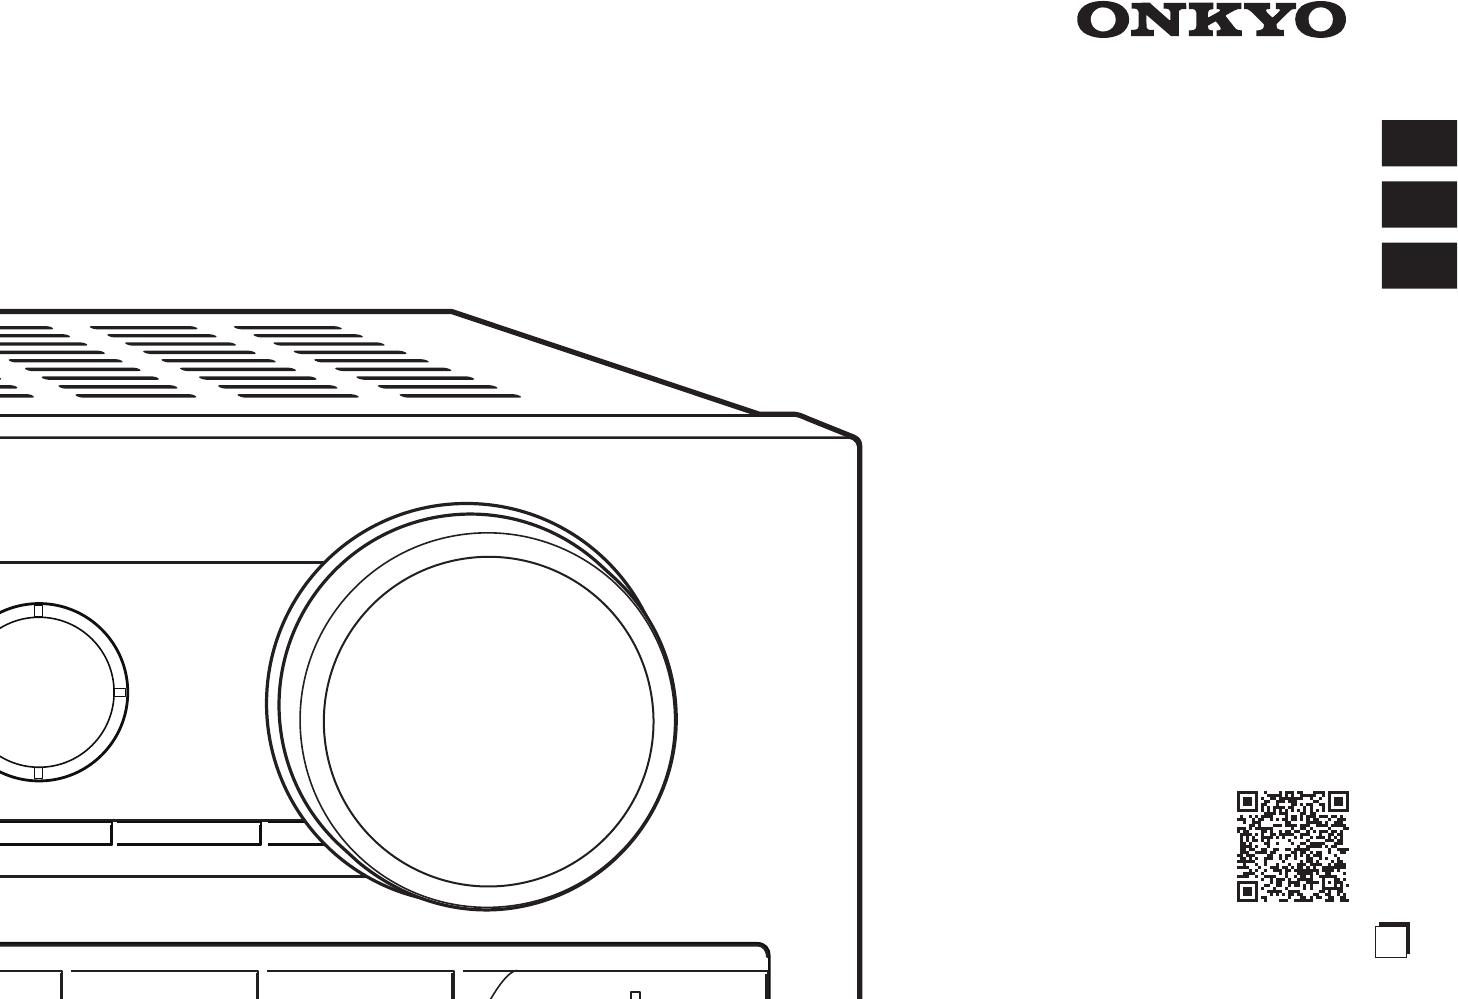 Handleiding Onkyo HT-R993 (pagina 1 van 70) (English